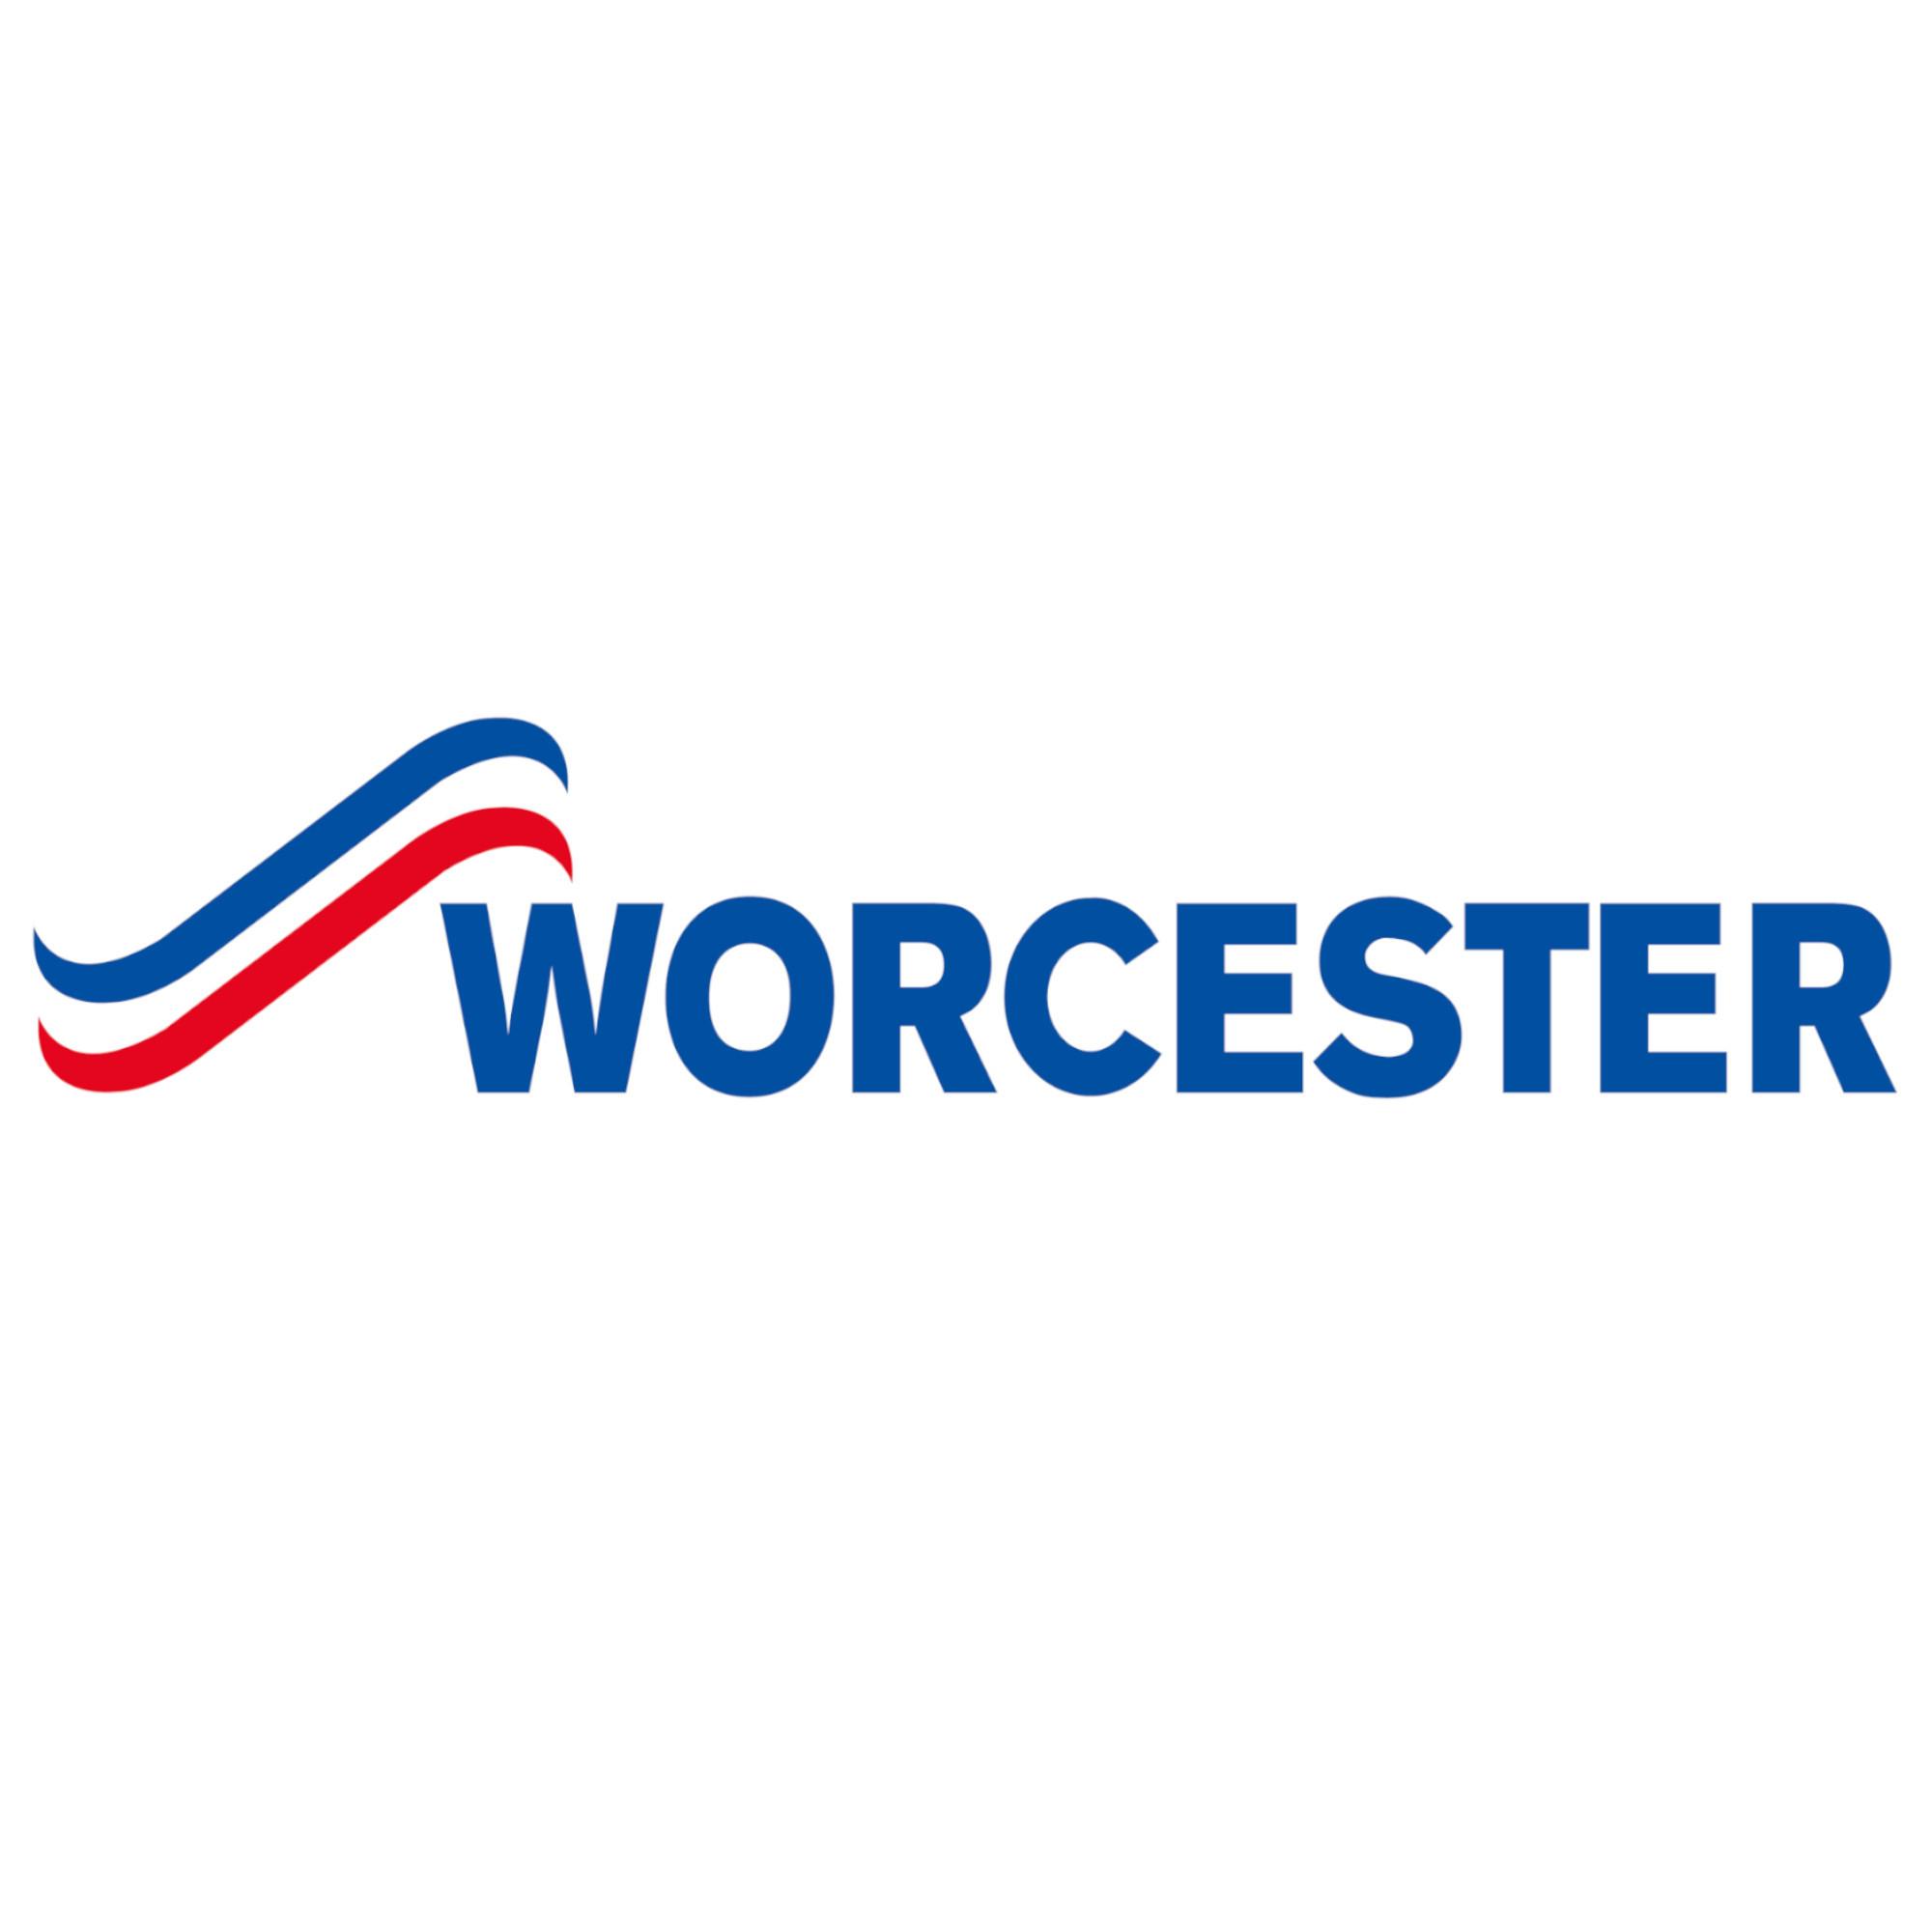 Worcester Brand Image